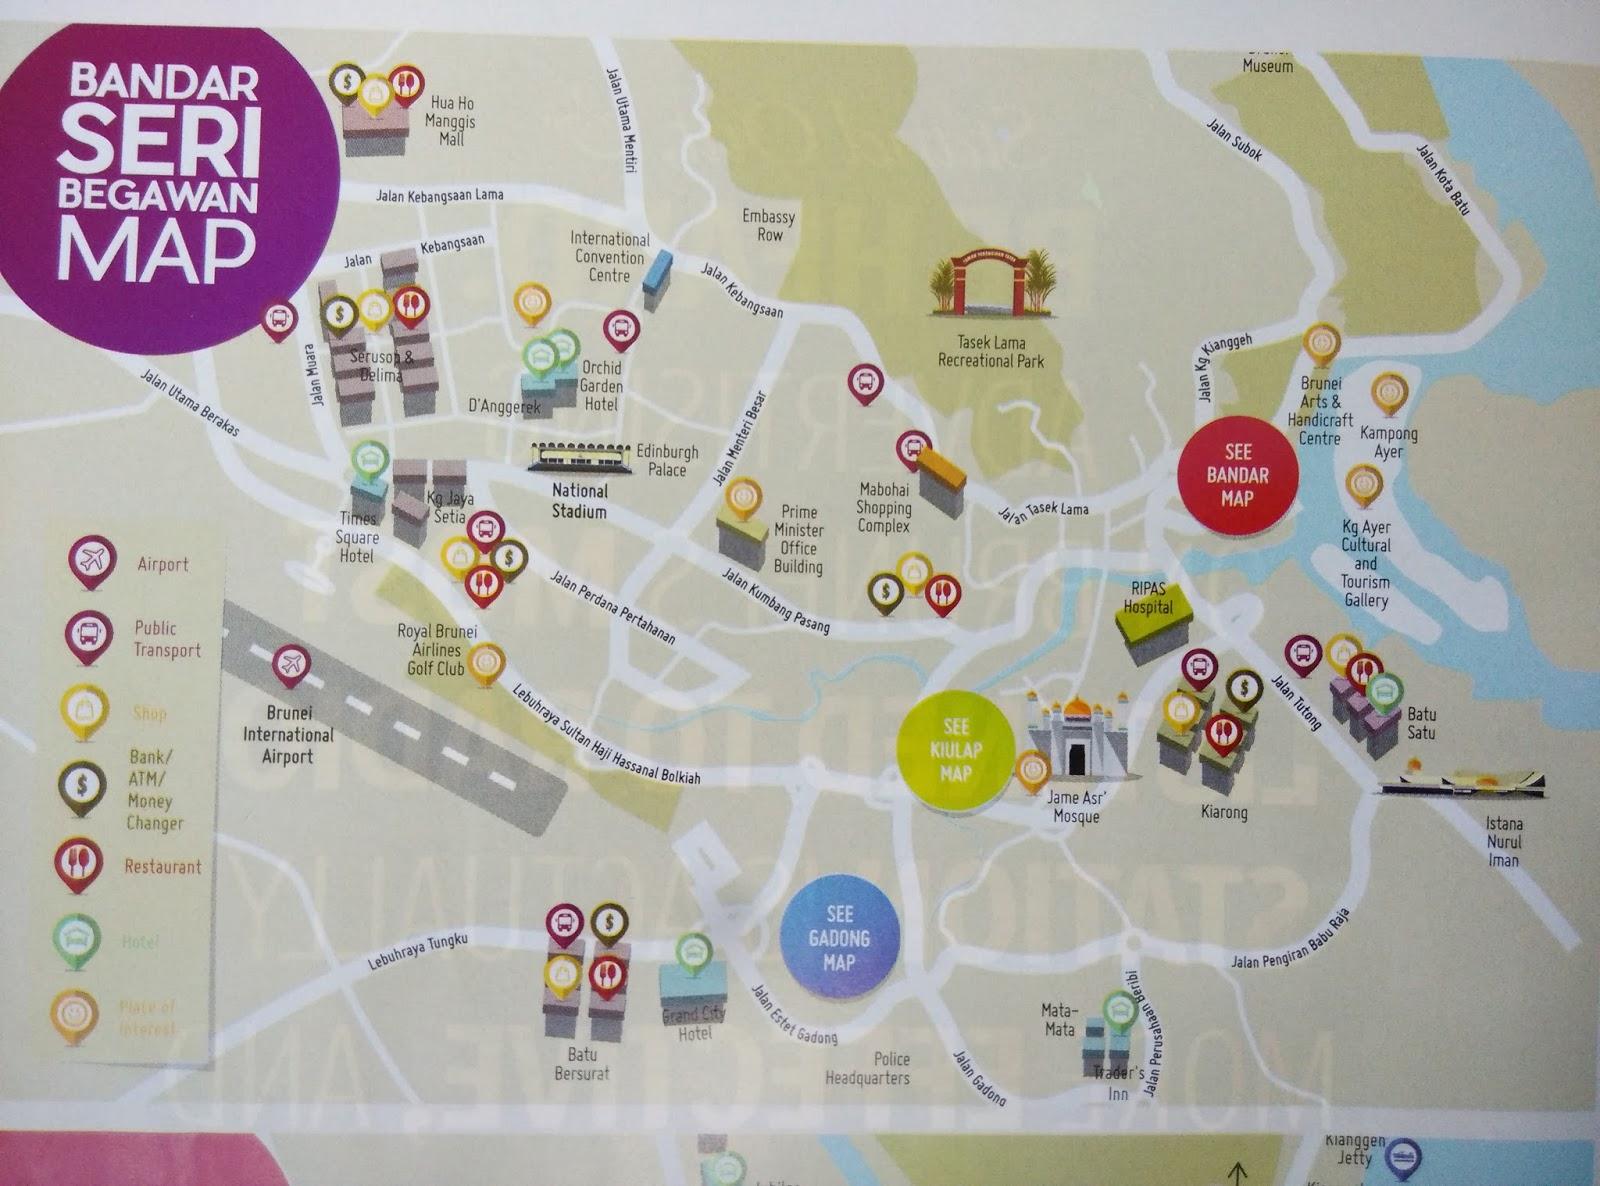 K M ChengTravel Journal Bandar Seri BegawanBrunei Iconic